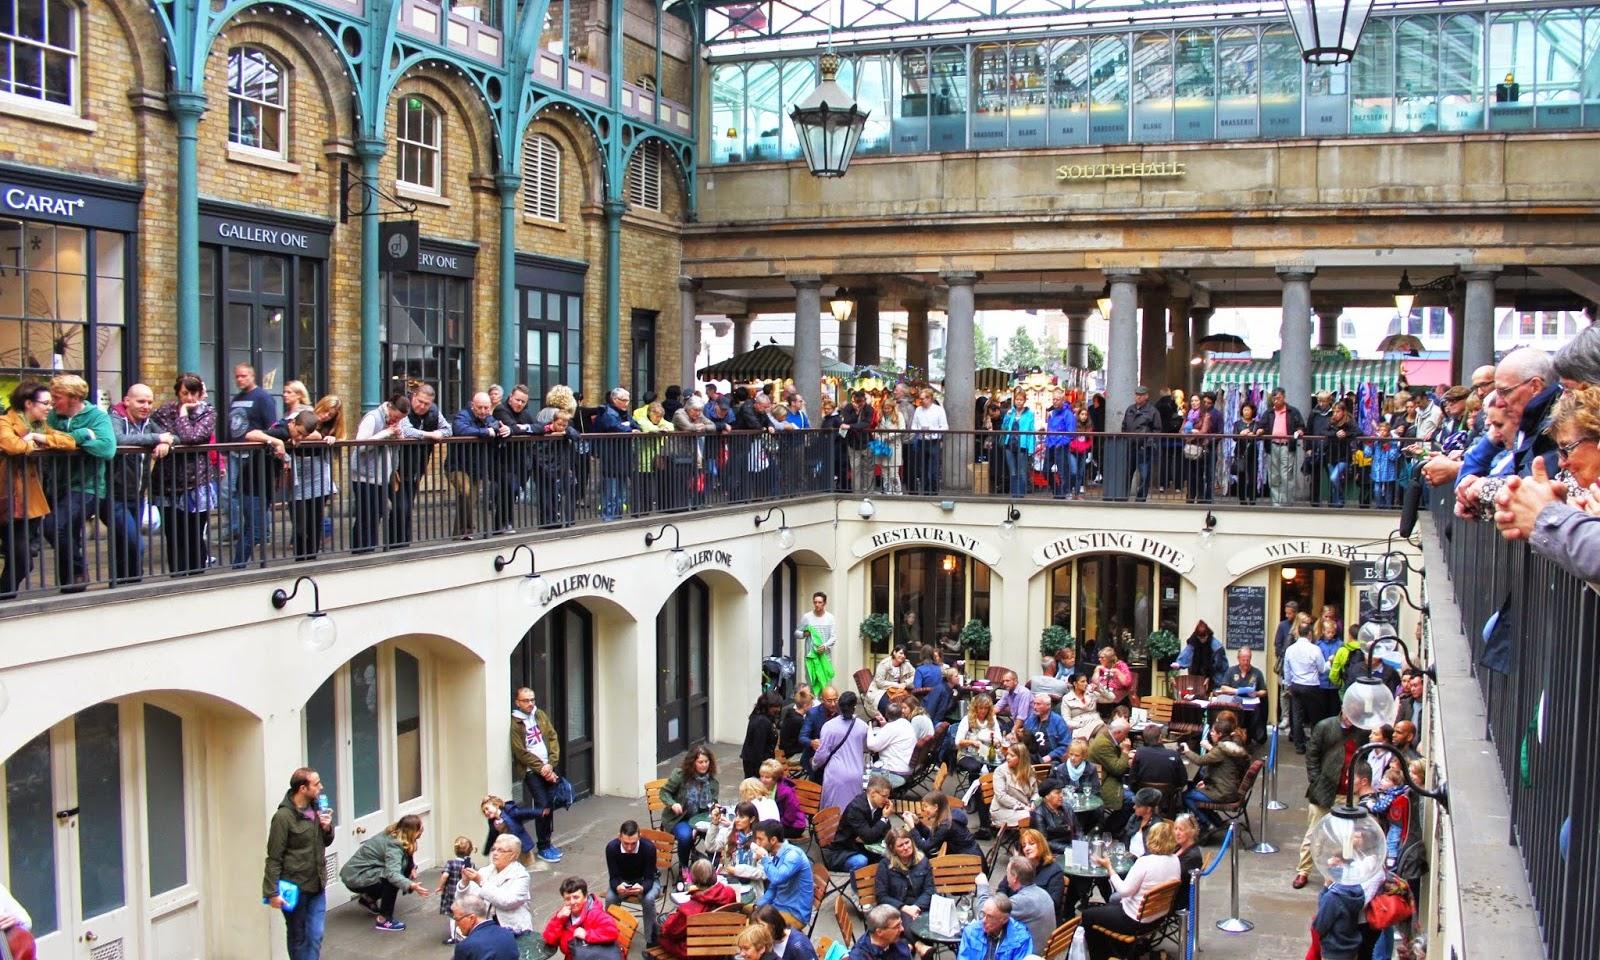 Clashing Time Talks Covent Garden